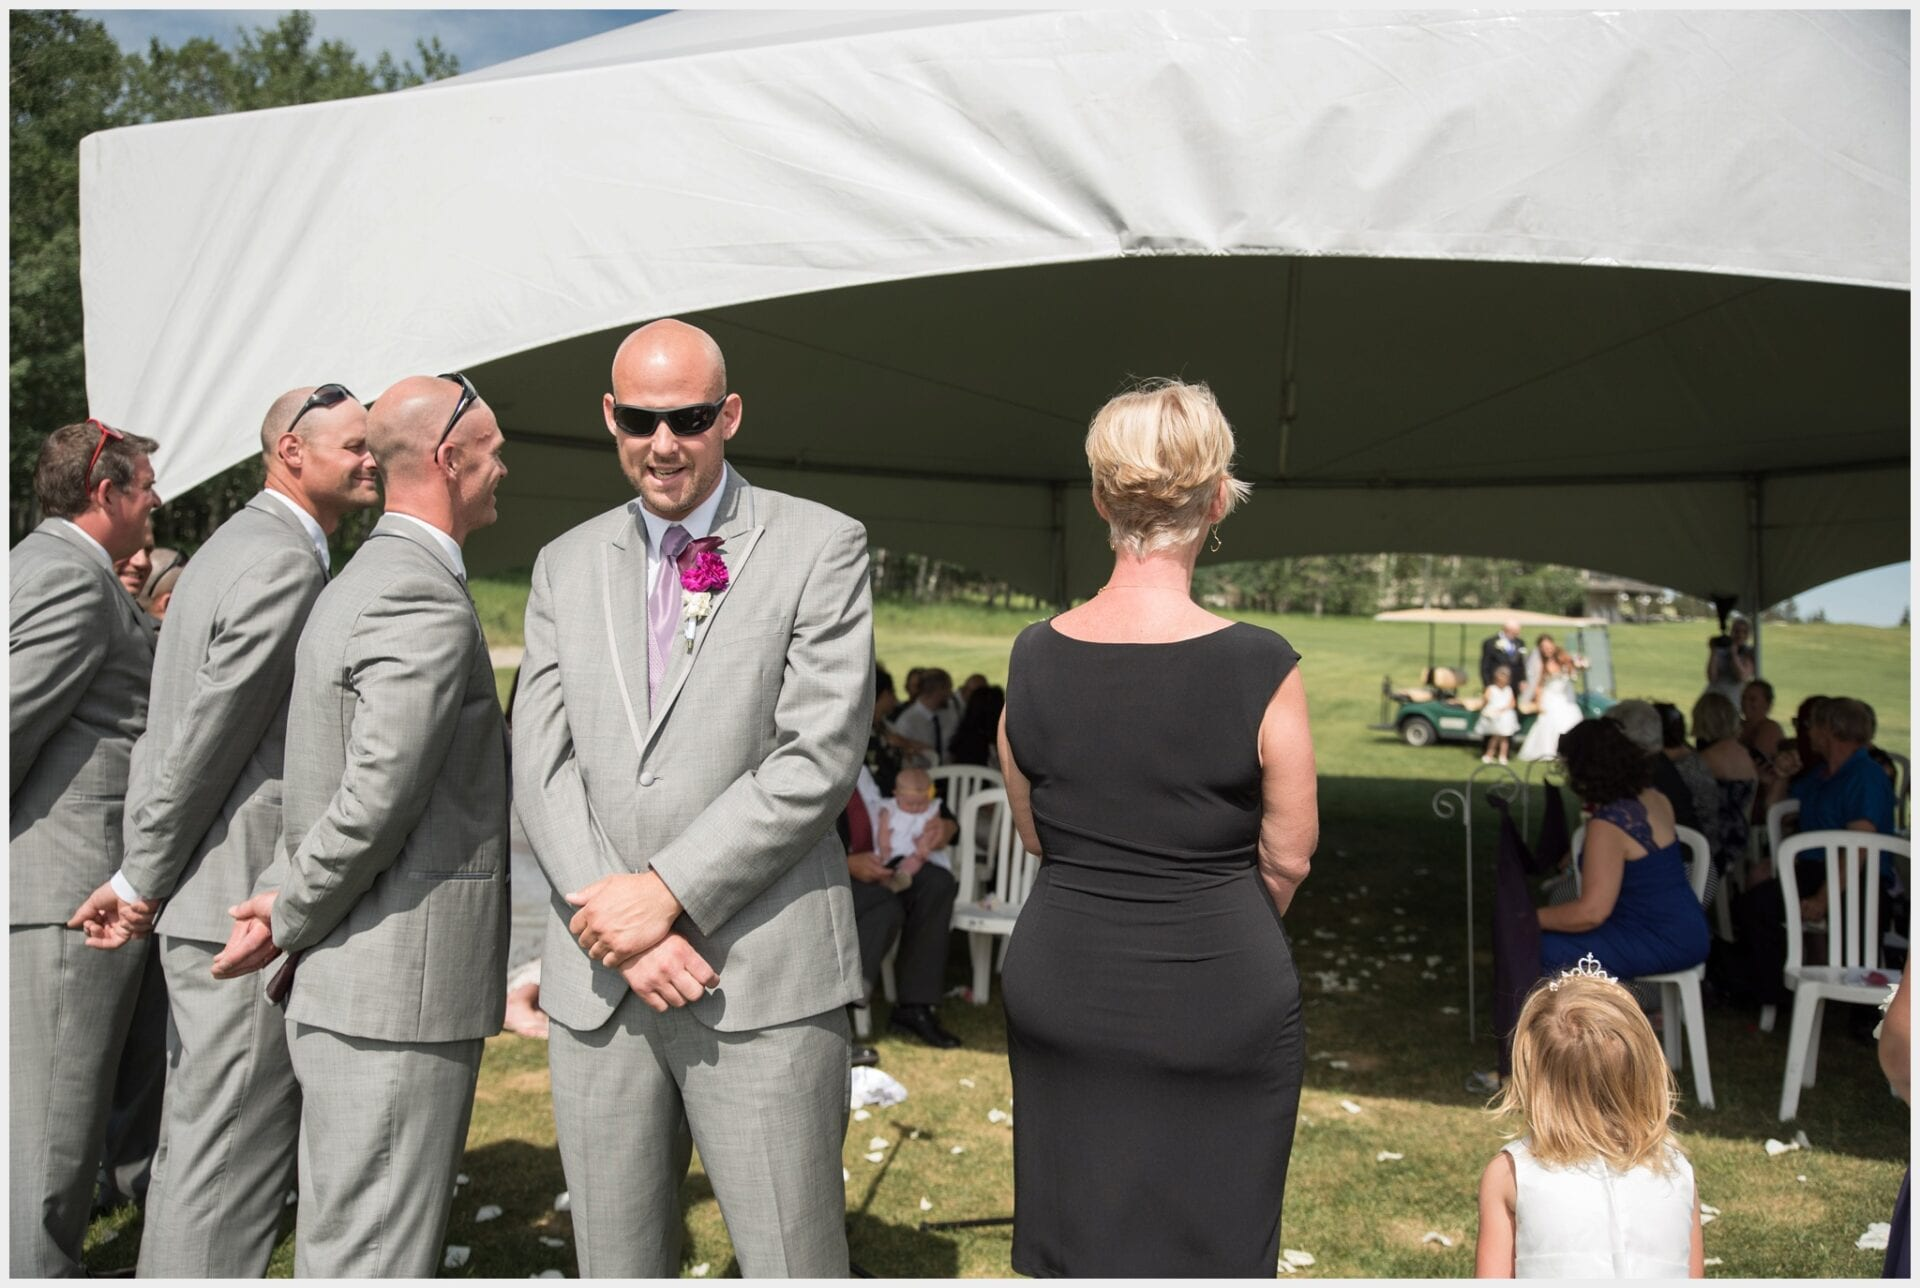 004-Calgary-Priddis Greens Golf and Country Club Wedding_Ceremony-Edmonton_Calgary_Photography-